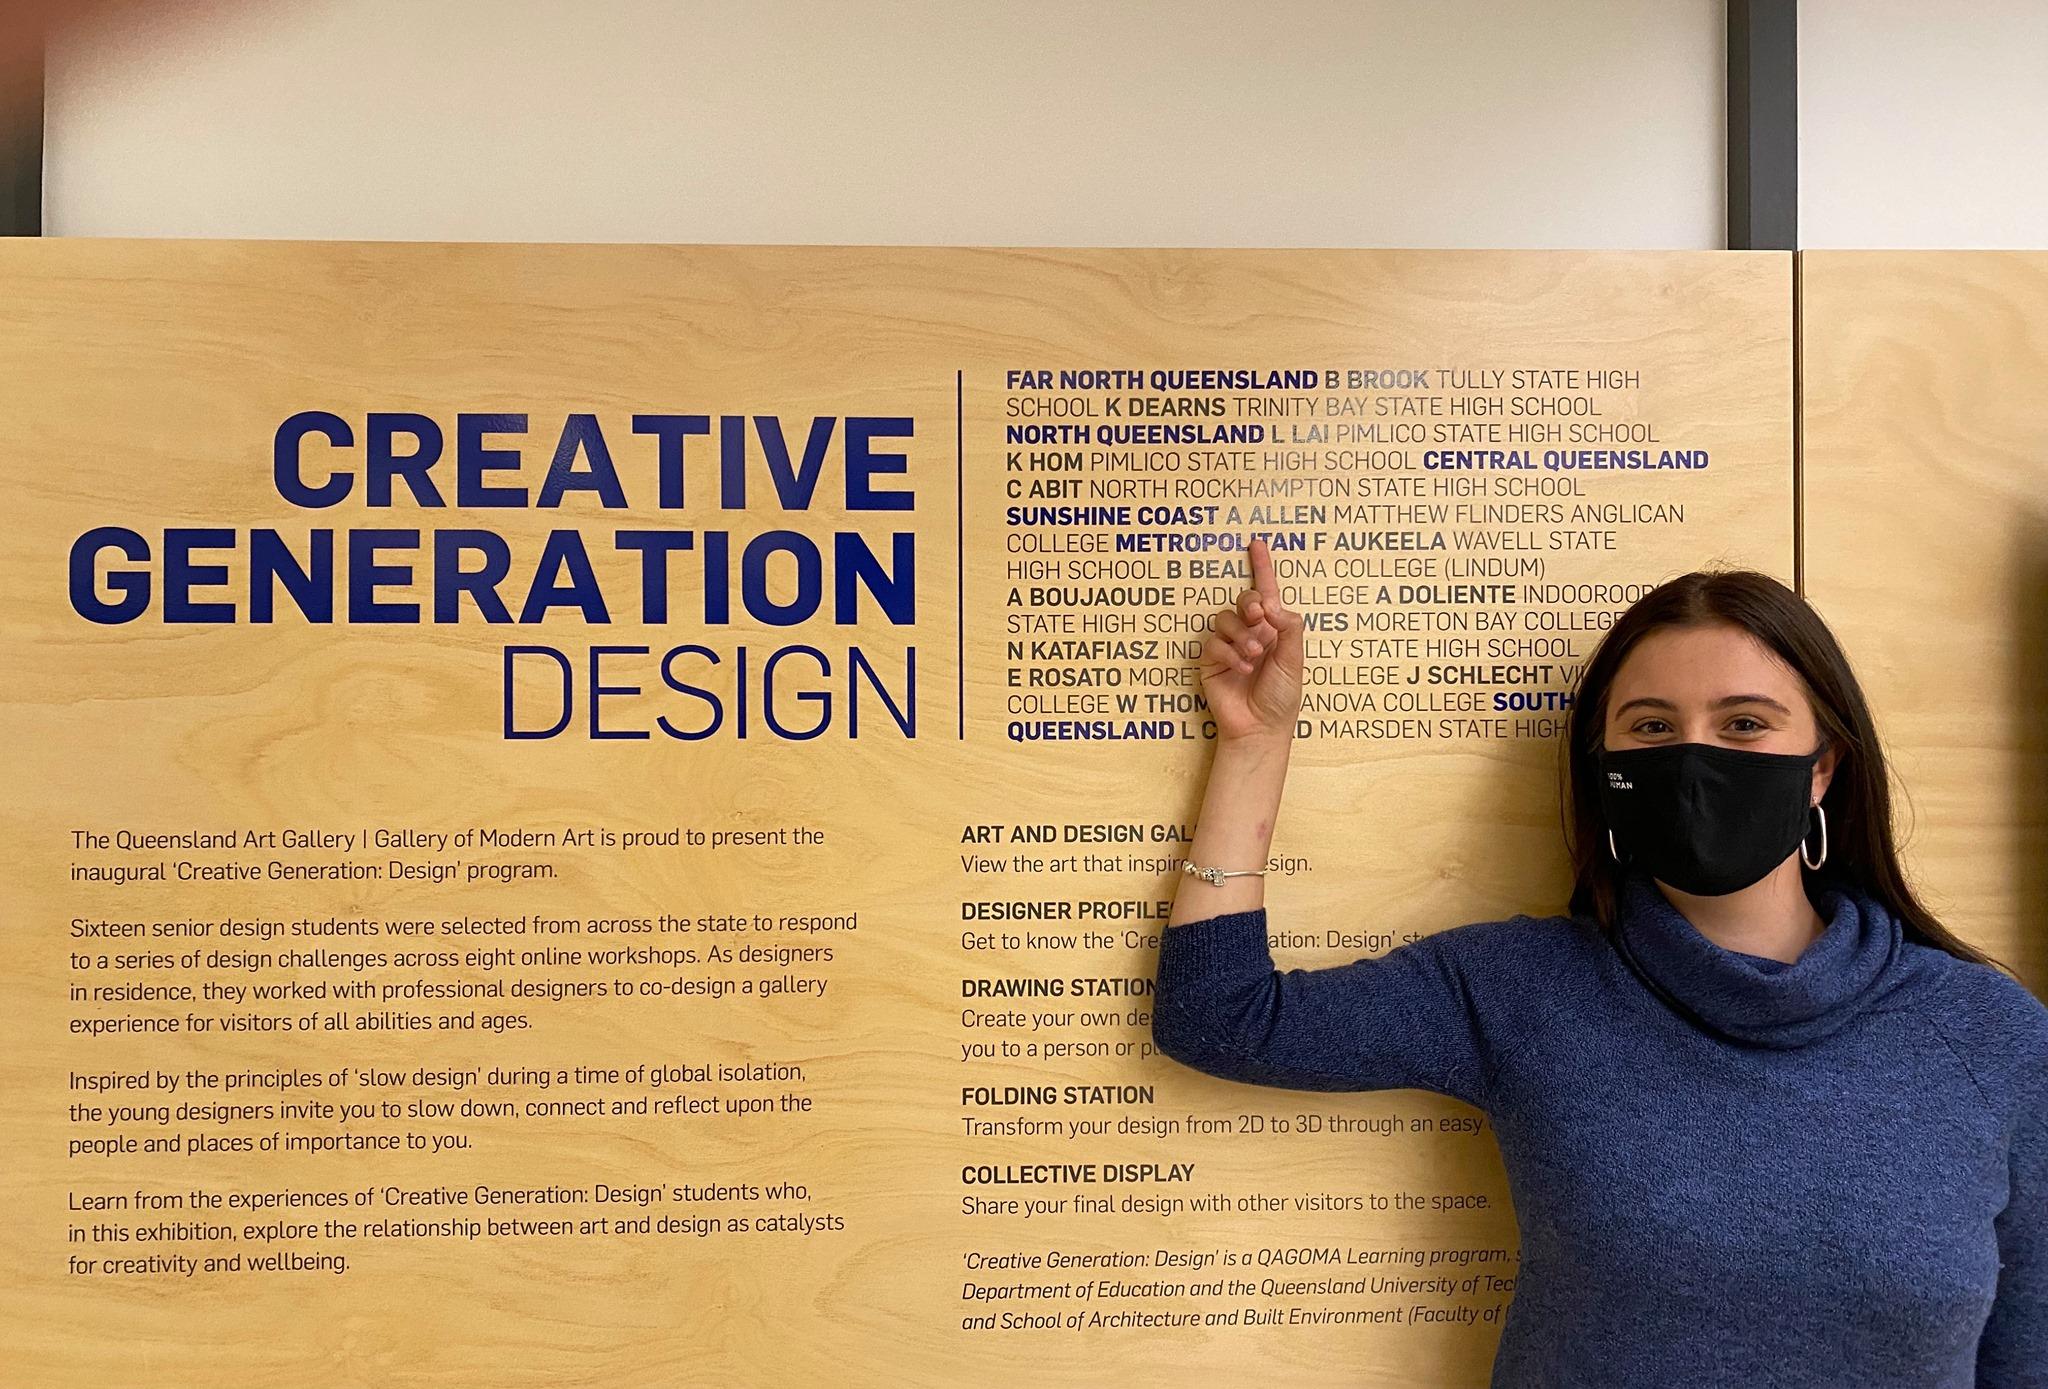 Ashley Allen Flinders Design student